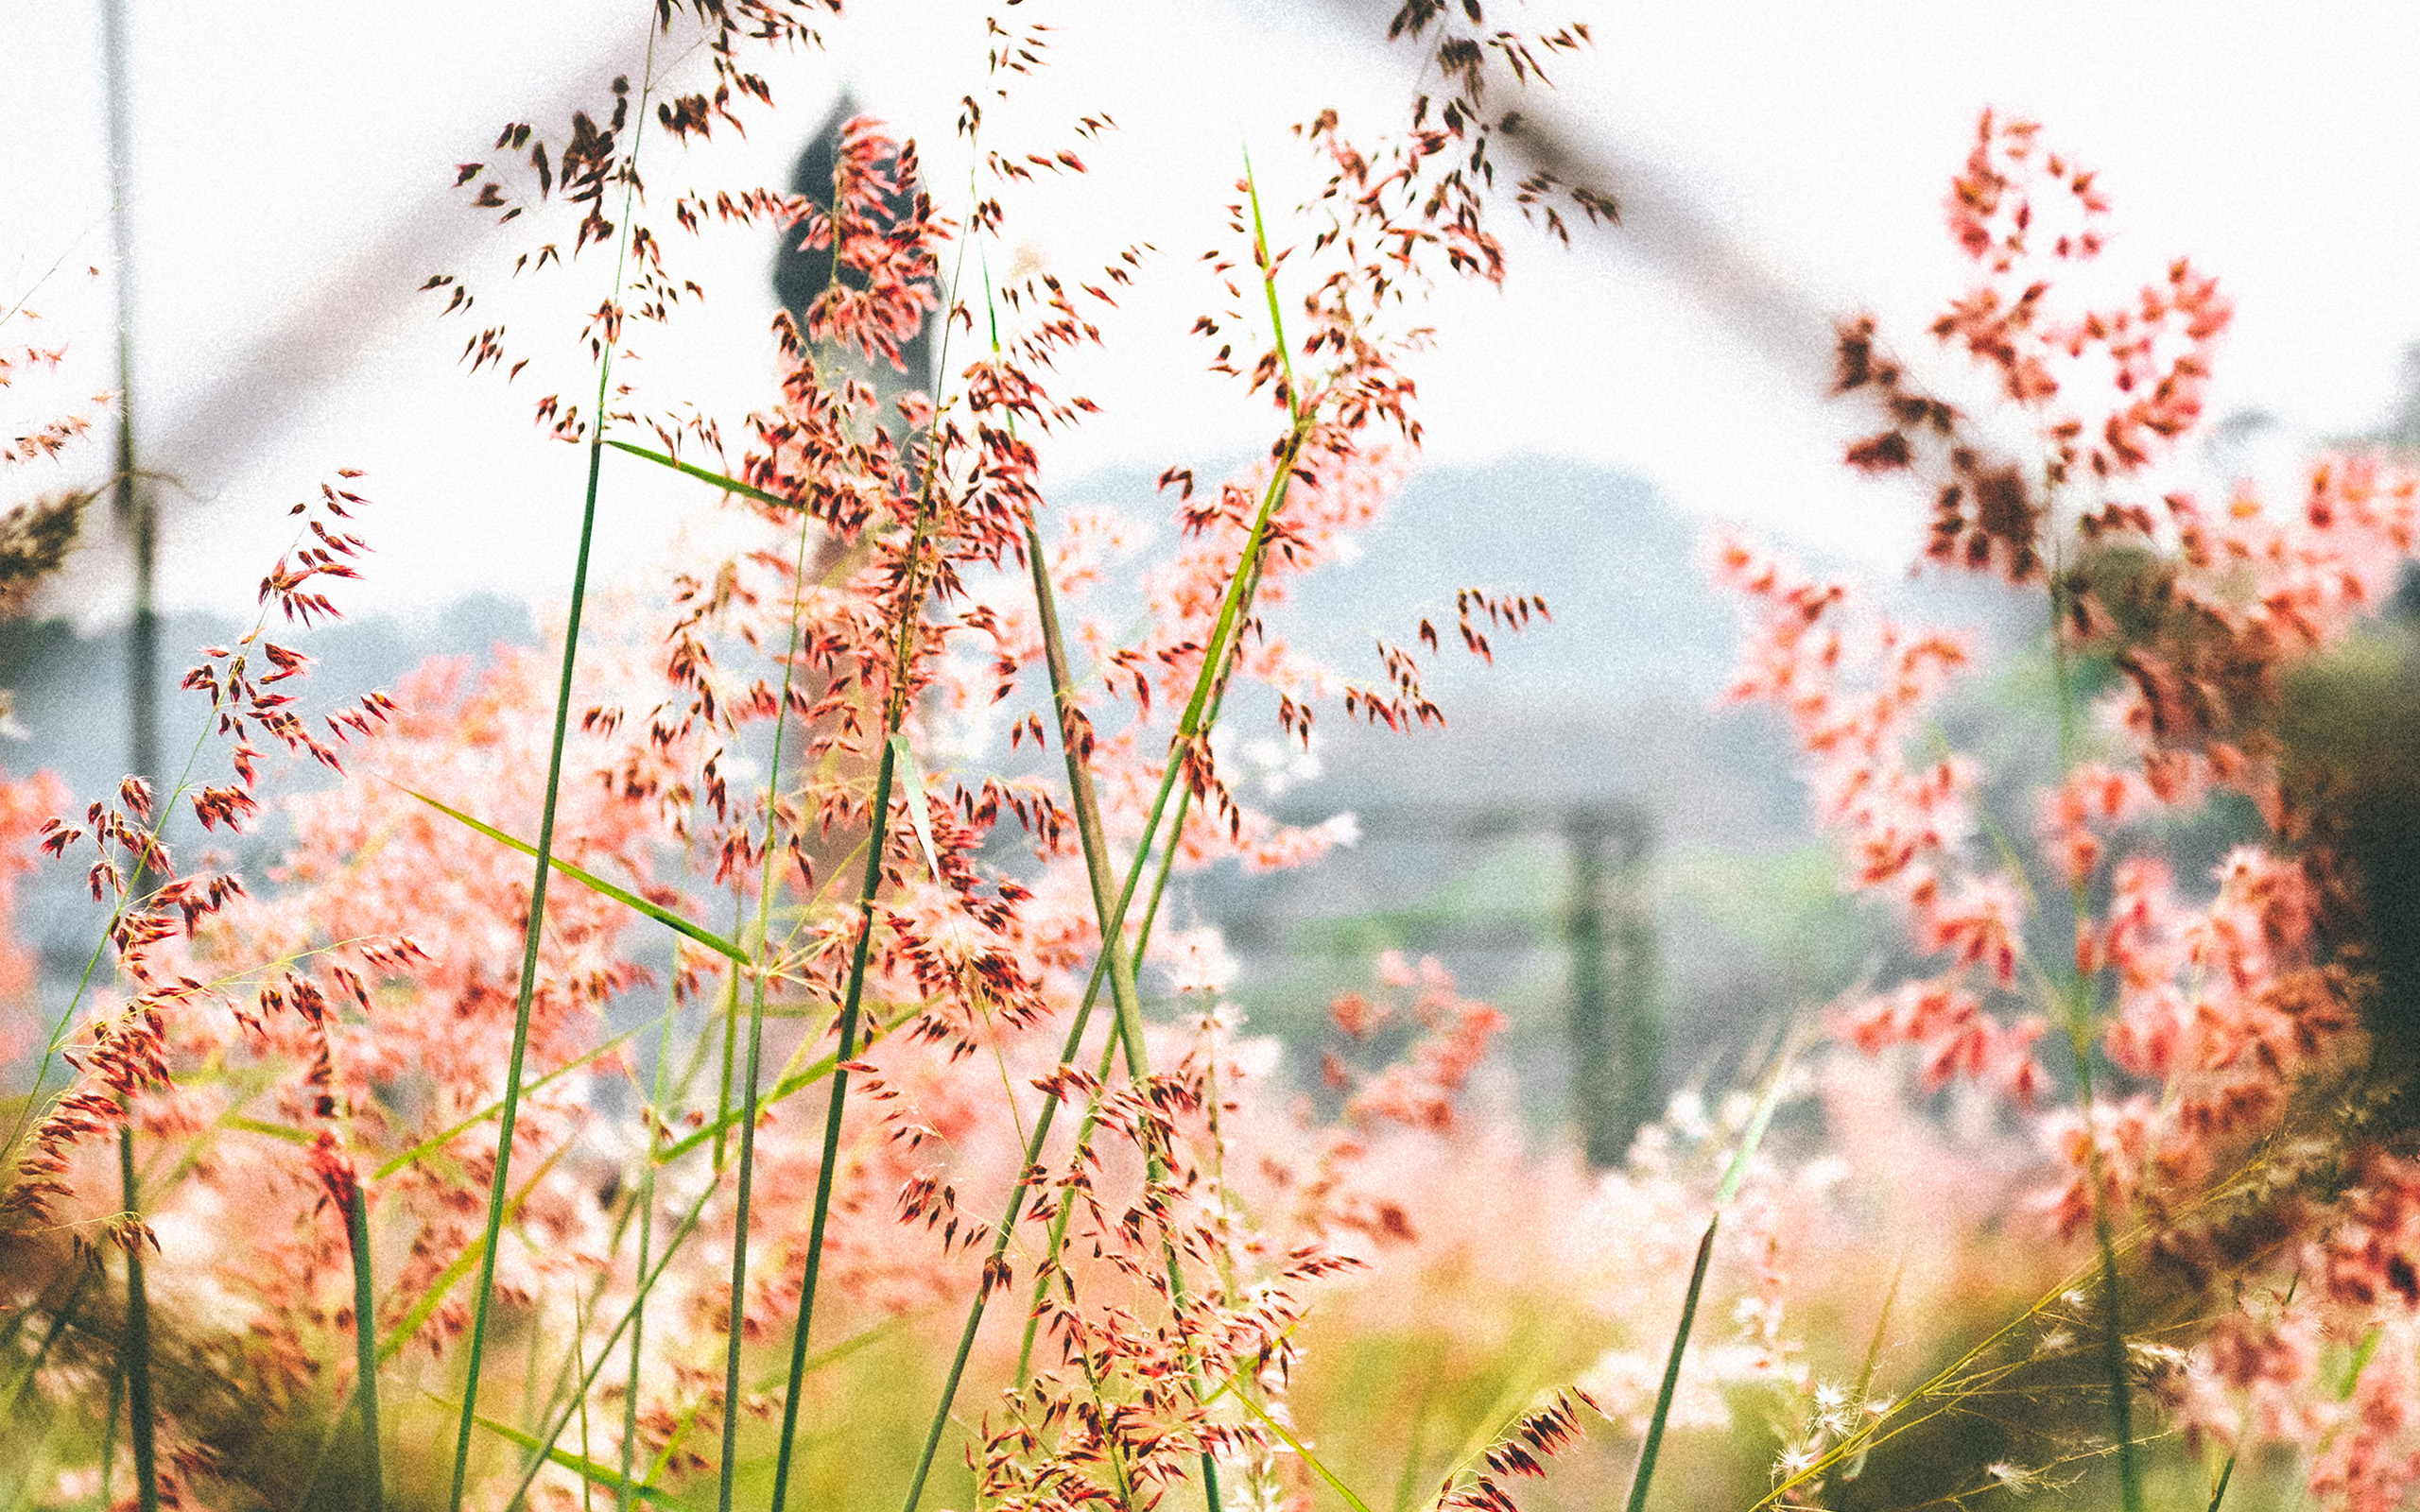 nw59-day-flower-nature-bokeh-wallpaper